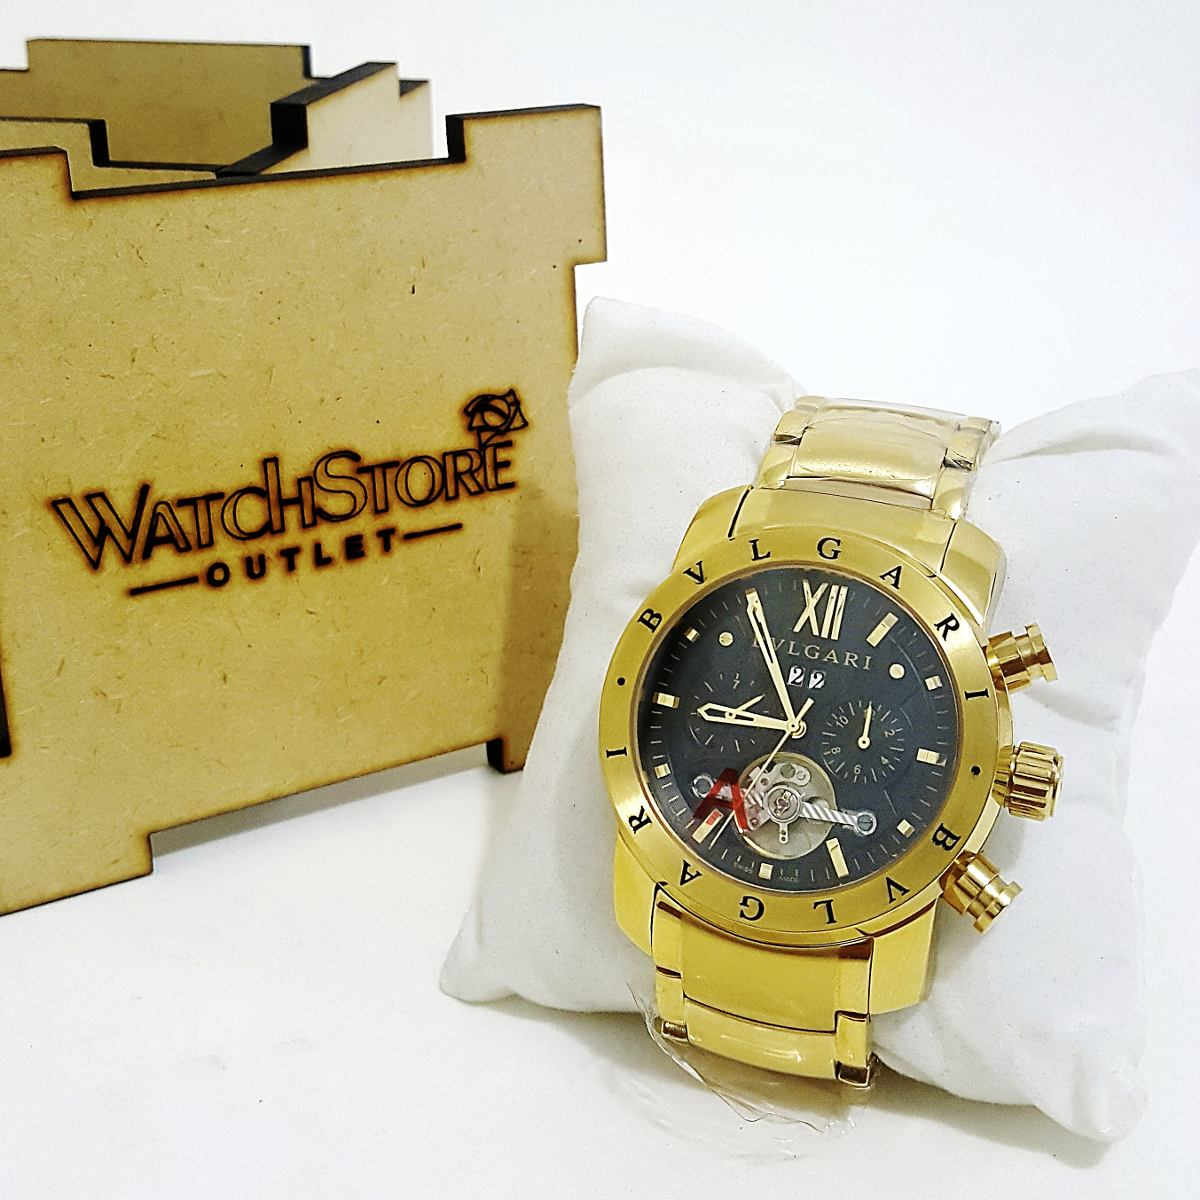 630039624d3 relógio bugari iron man automático dourado (novo). Carregando zoom.